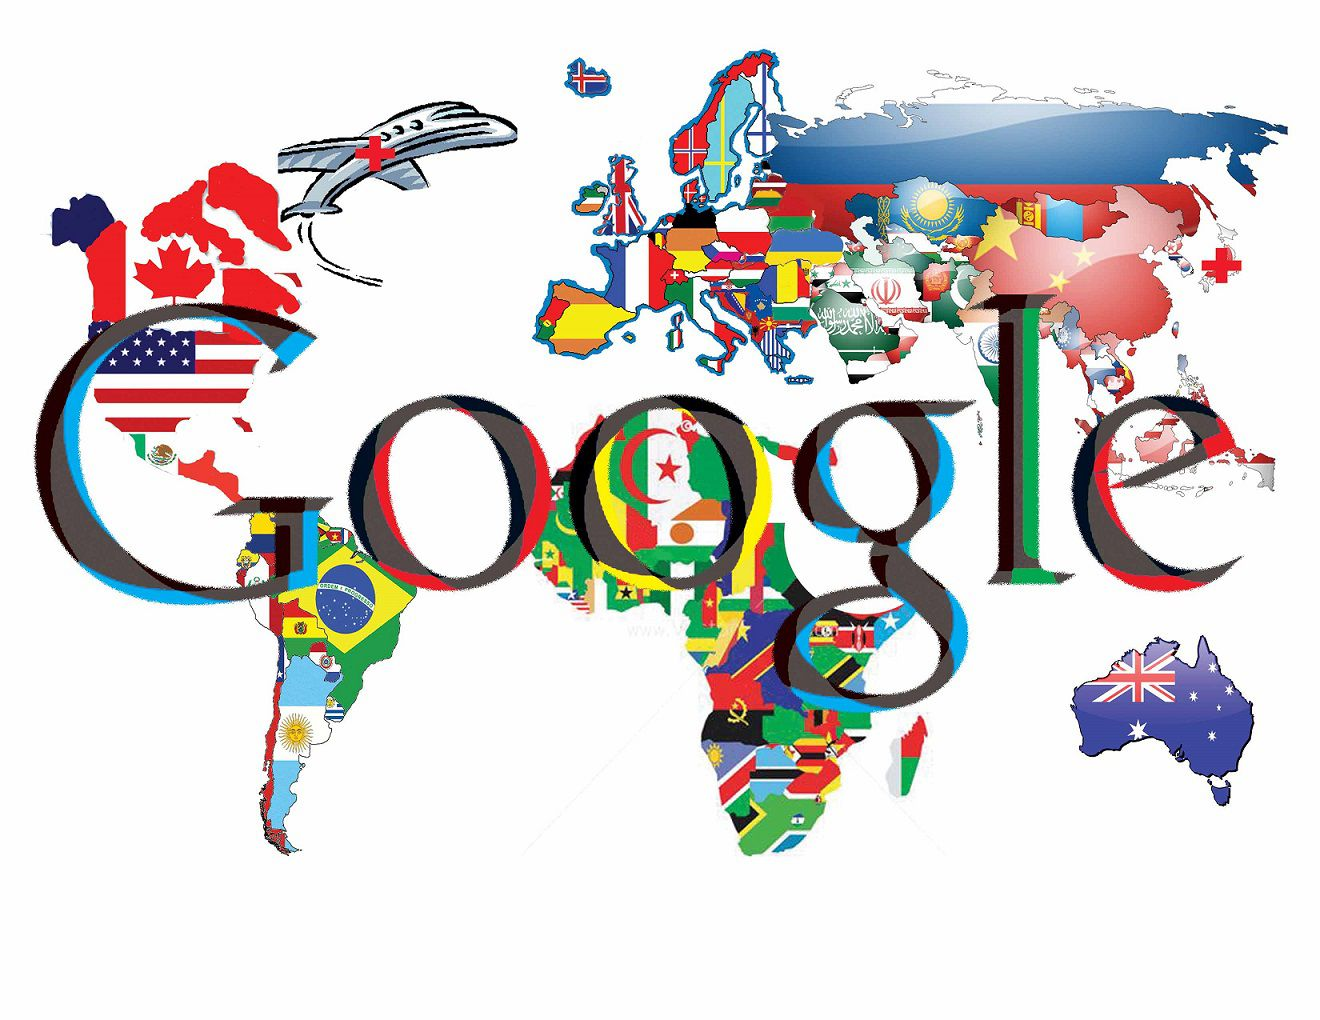 لوگوی گوگل تغییر کرد + تصویر